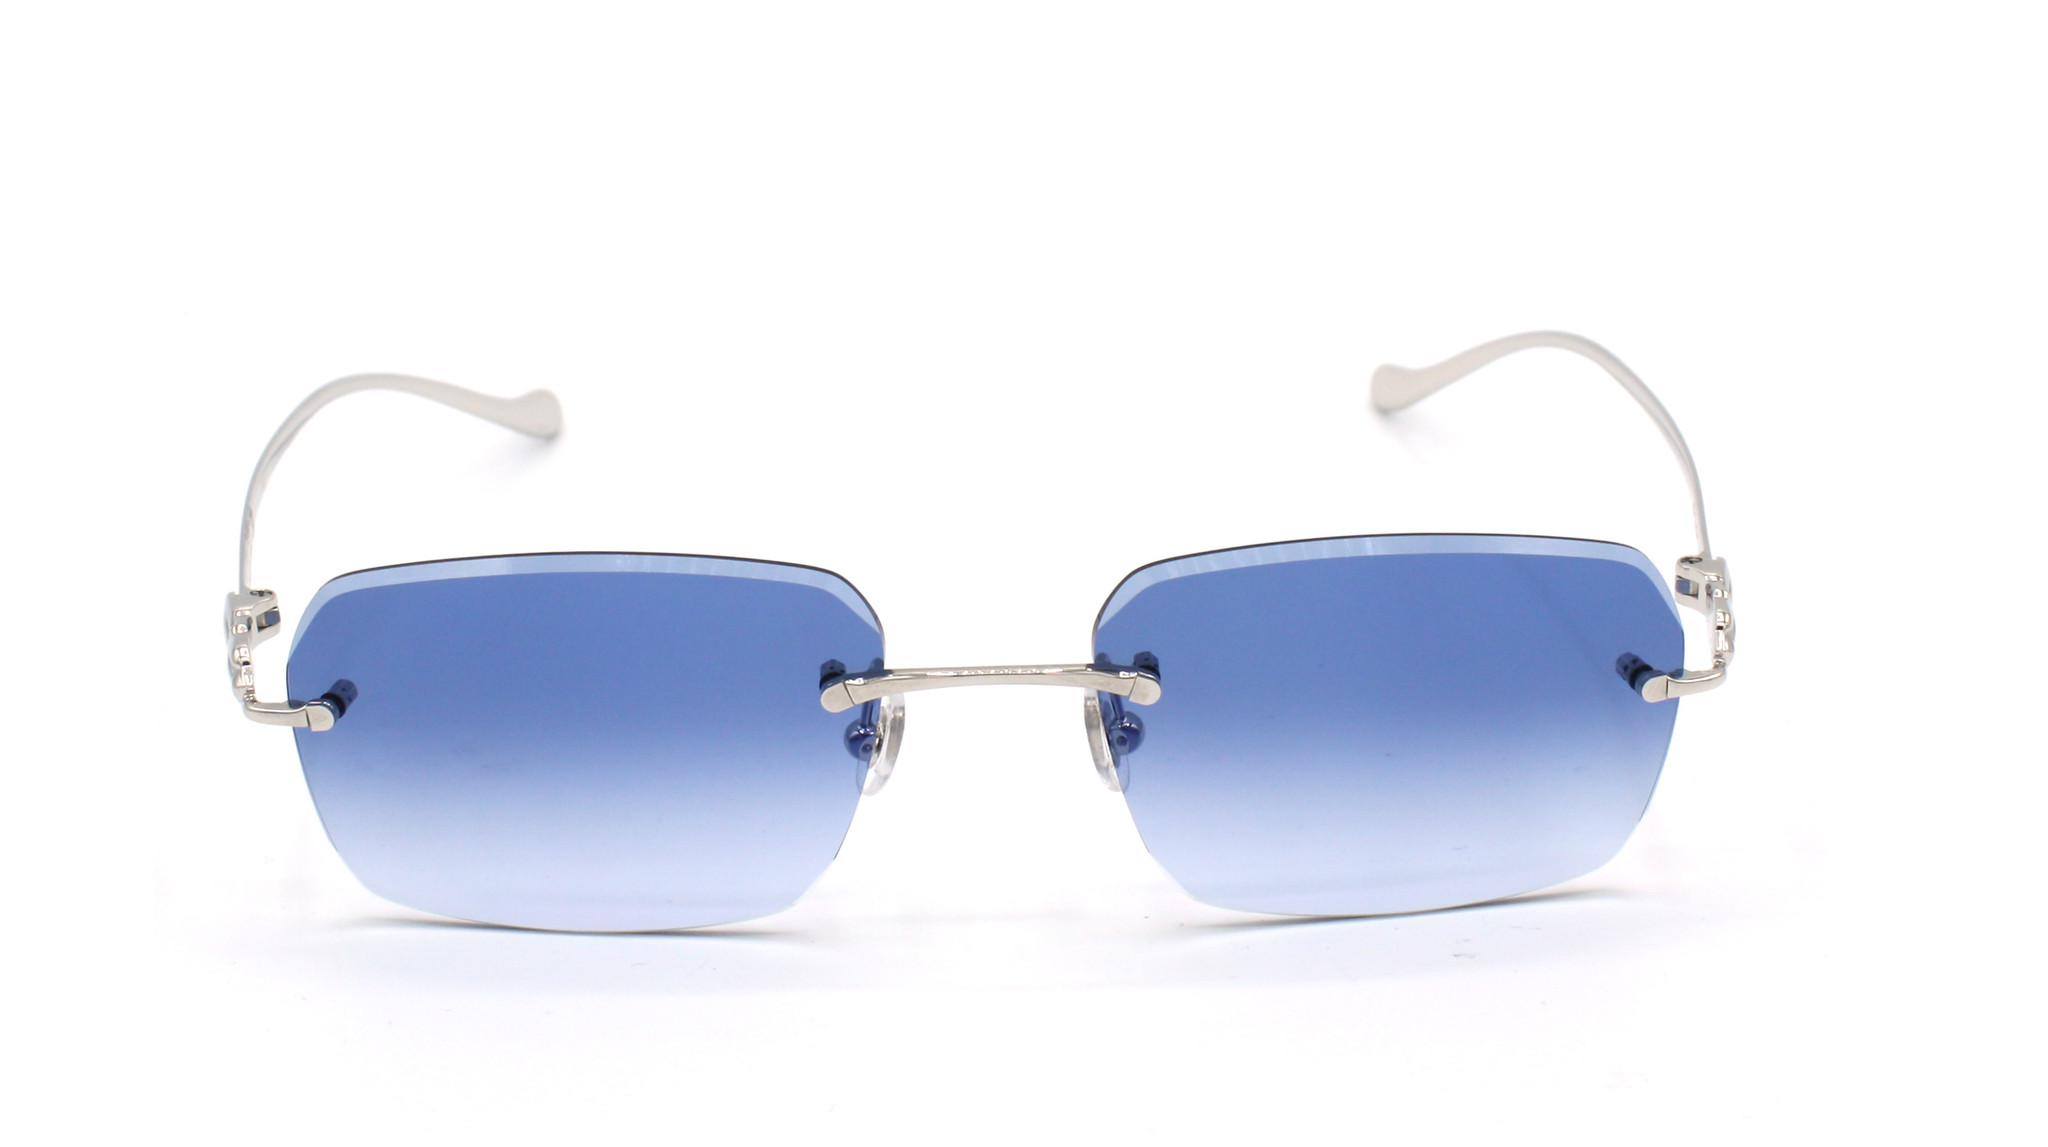 Cartier - CT0061O - 003 - Marlin Greyish Blue Diamond Cut-1